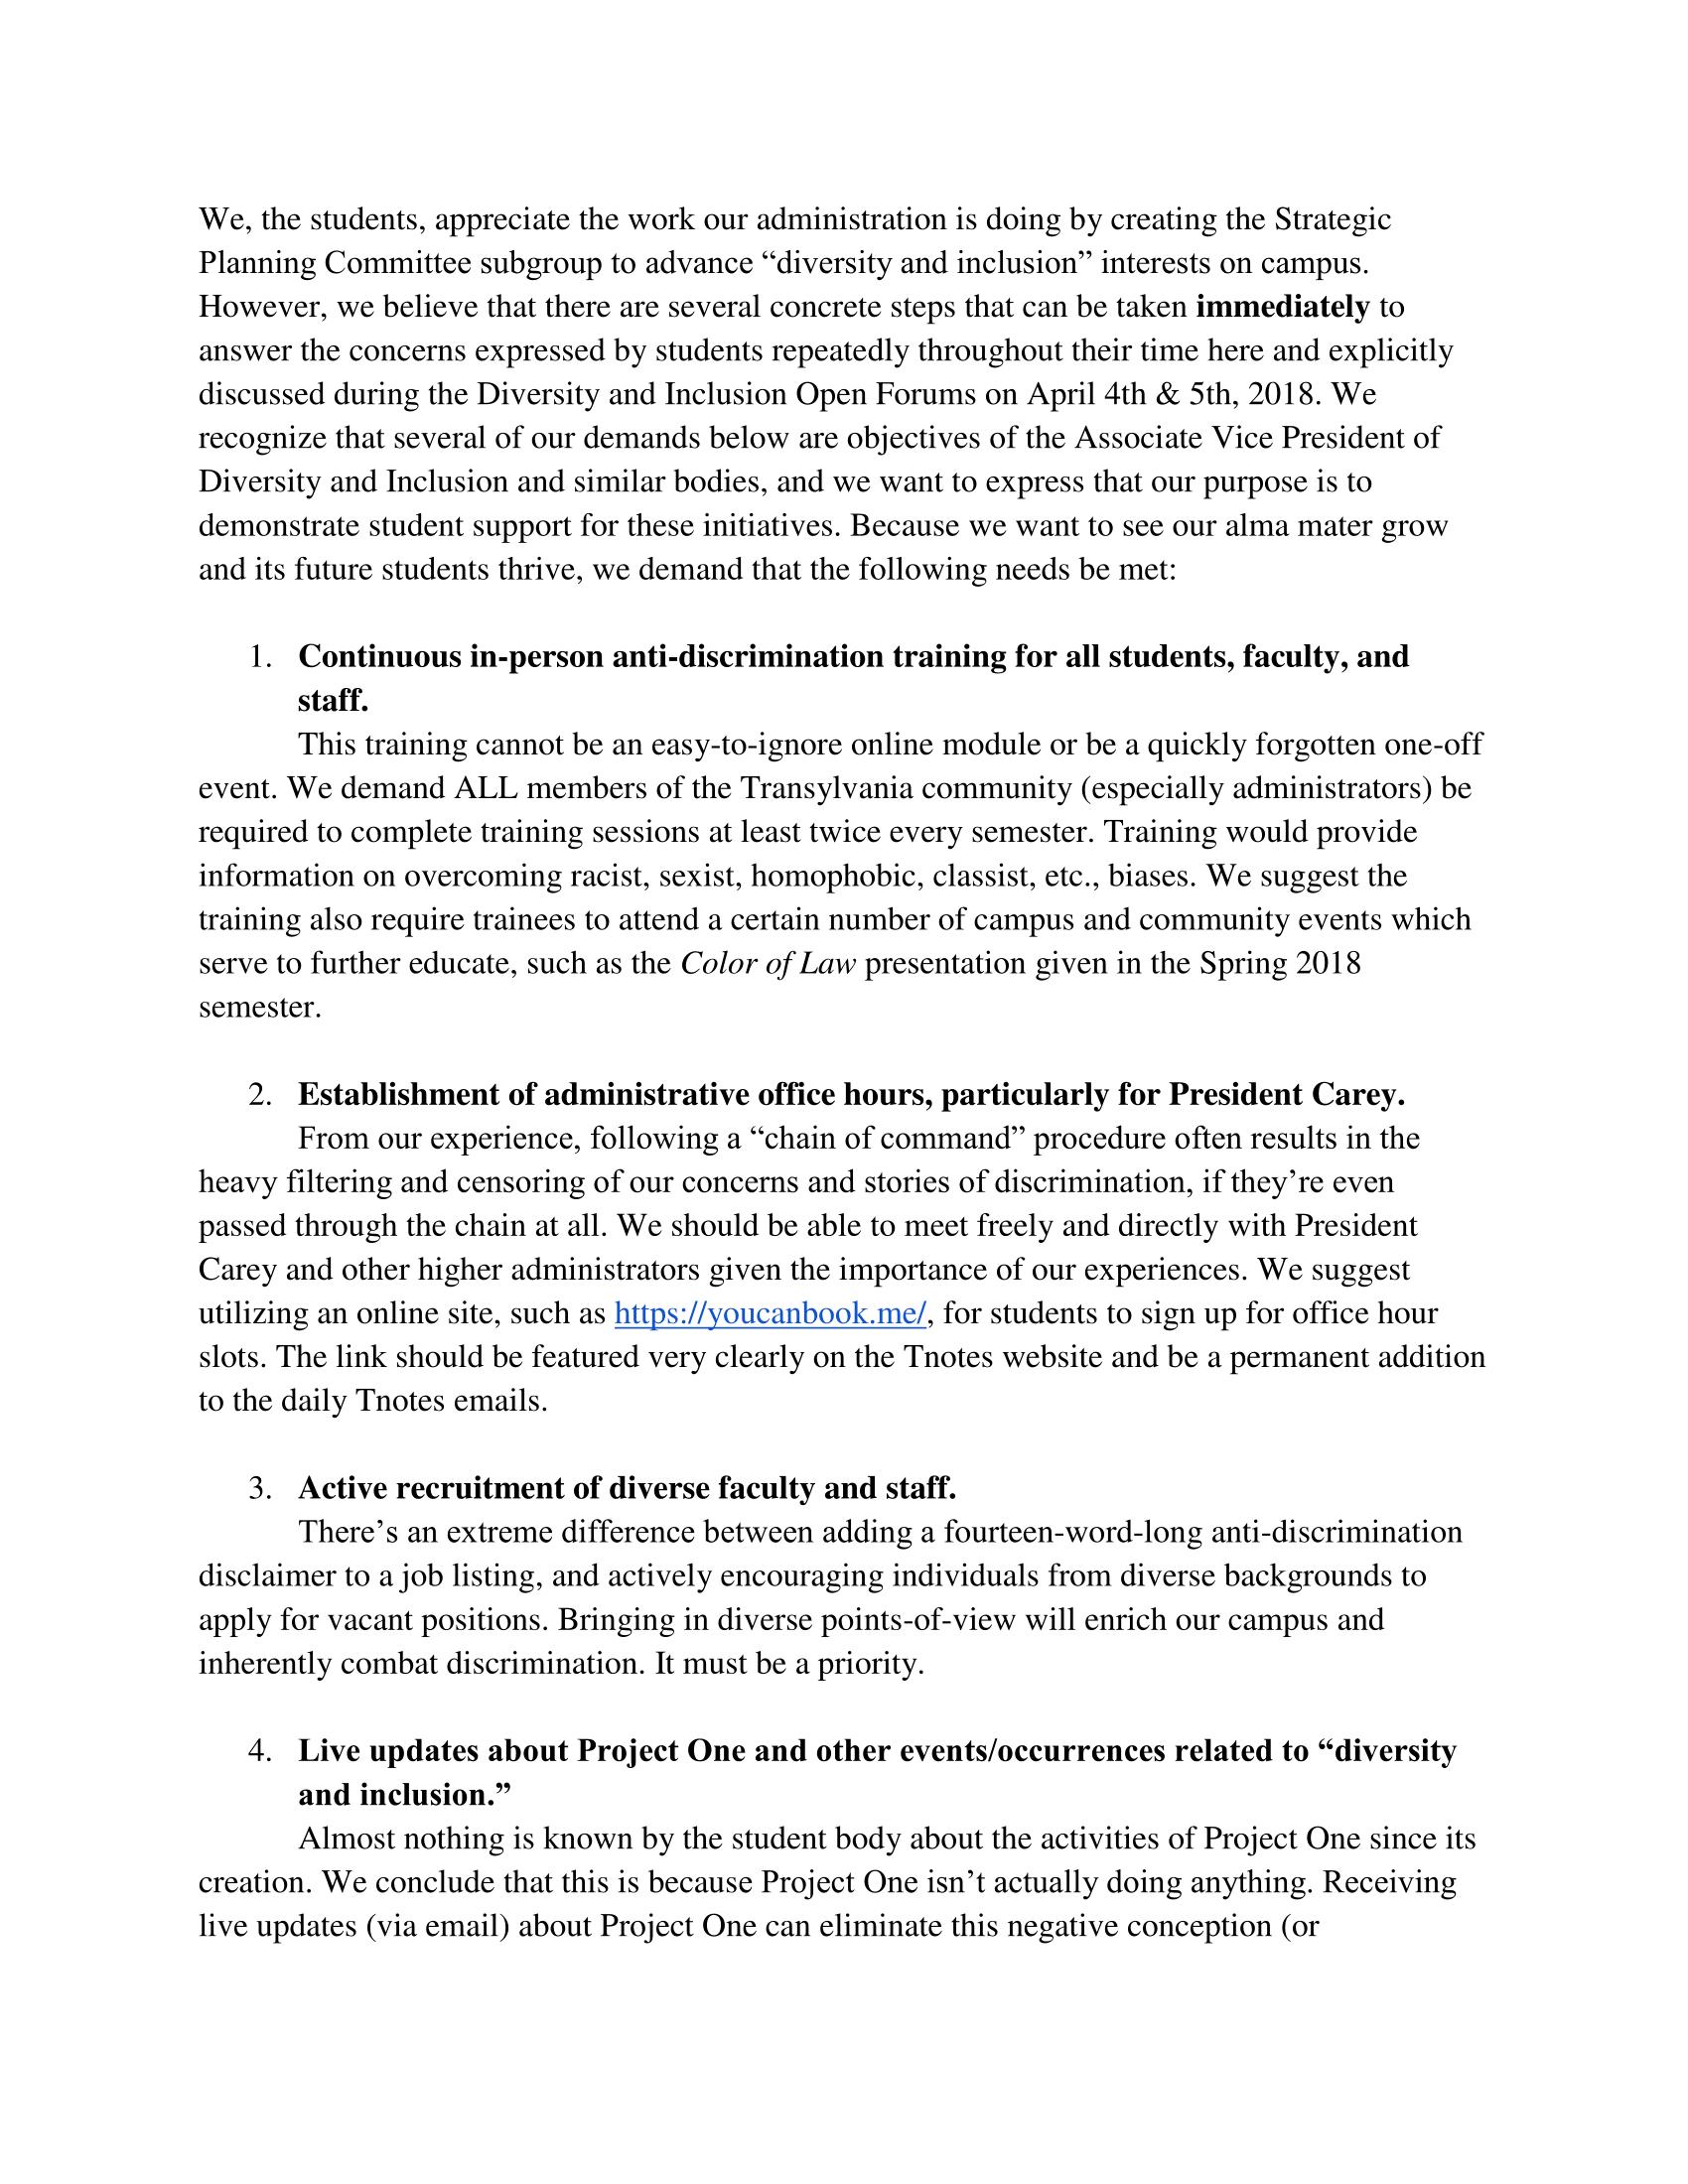 Demonstrators' list of demands, page 1